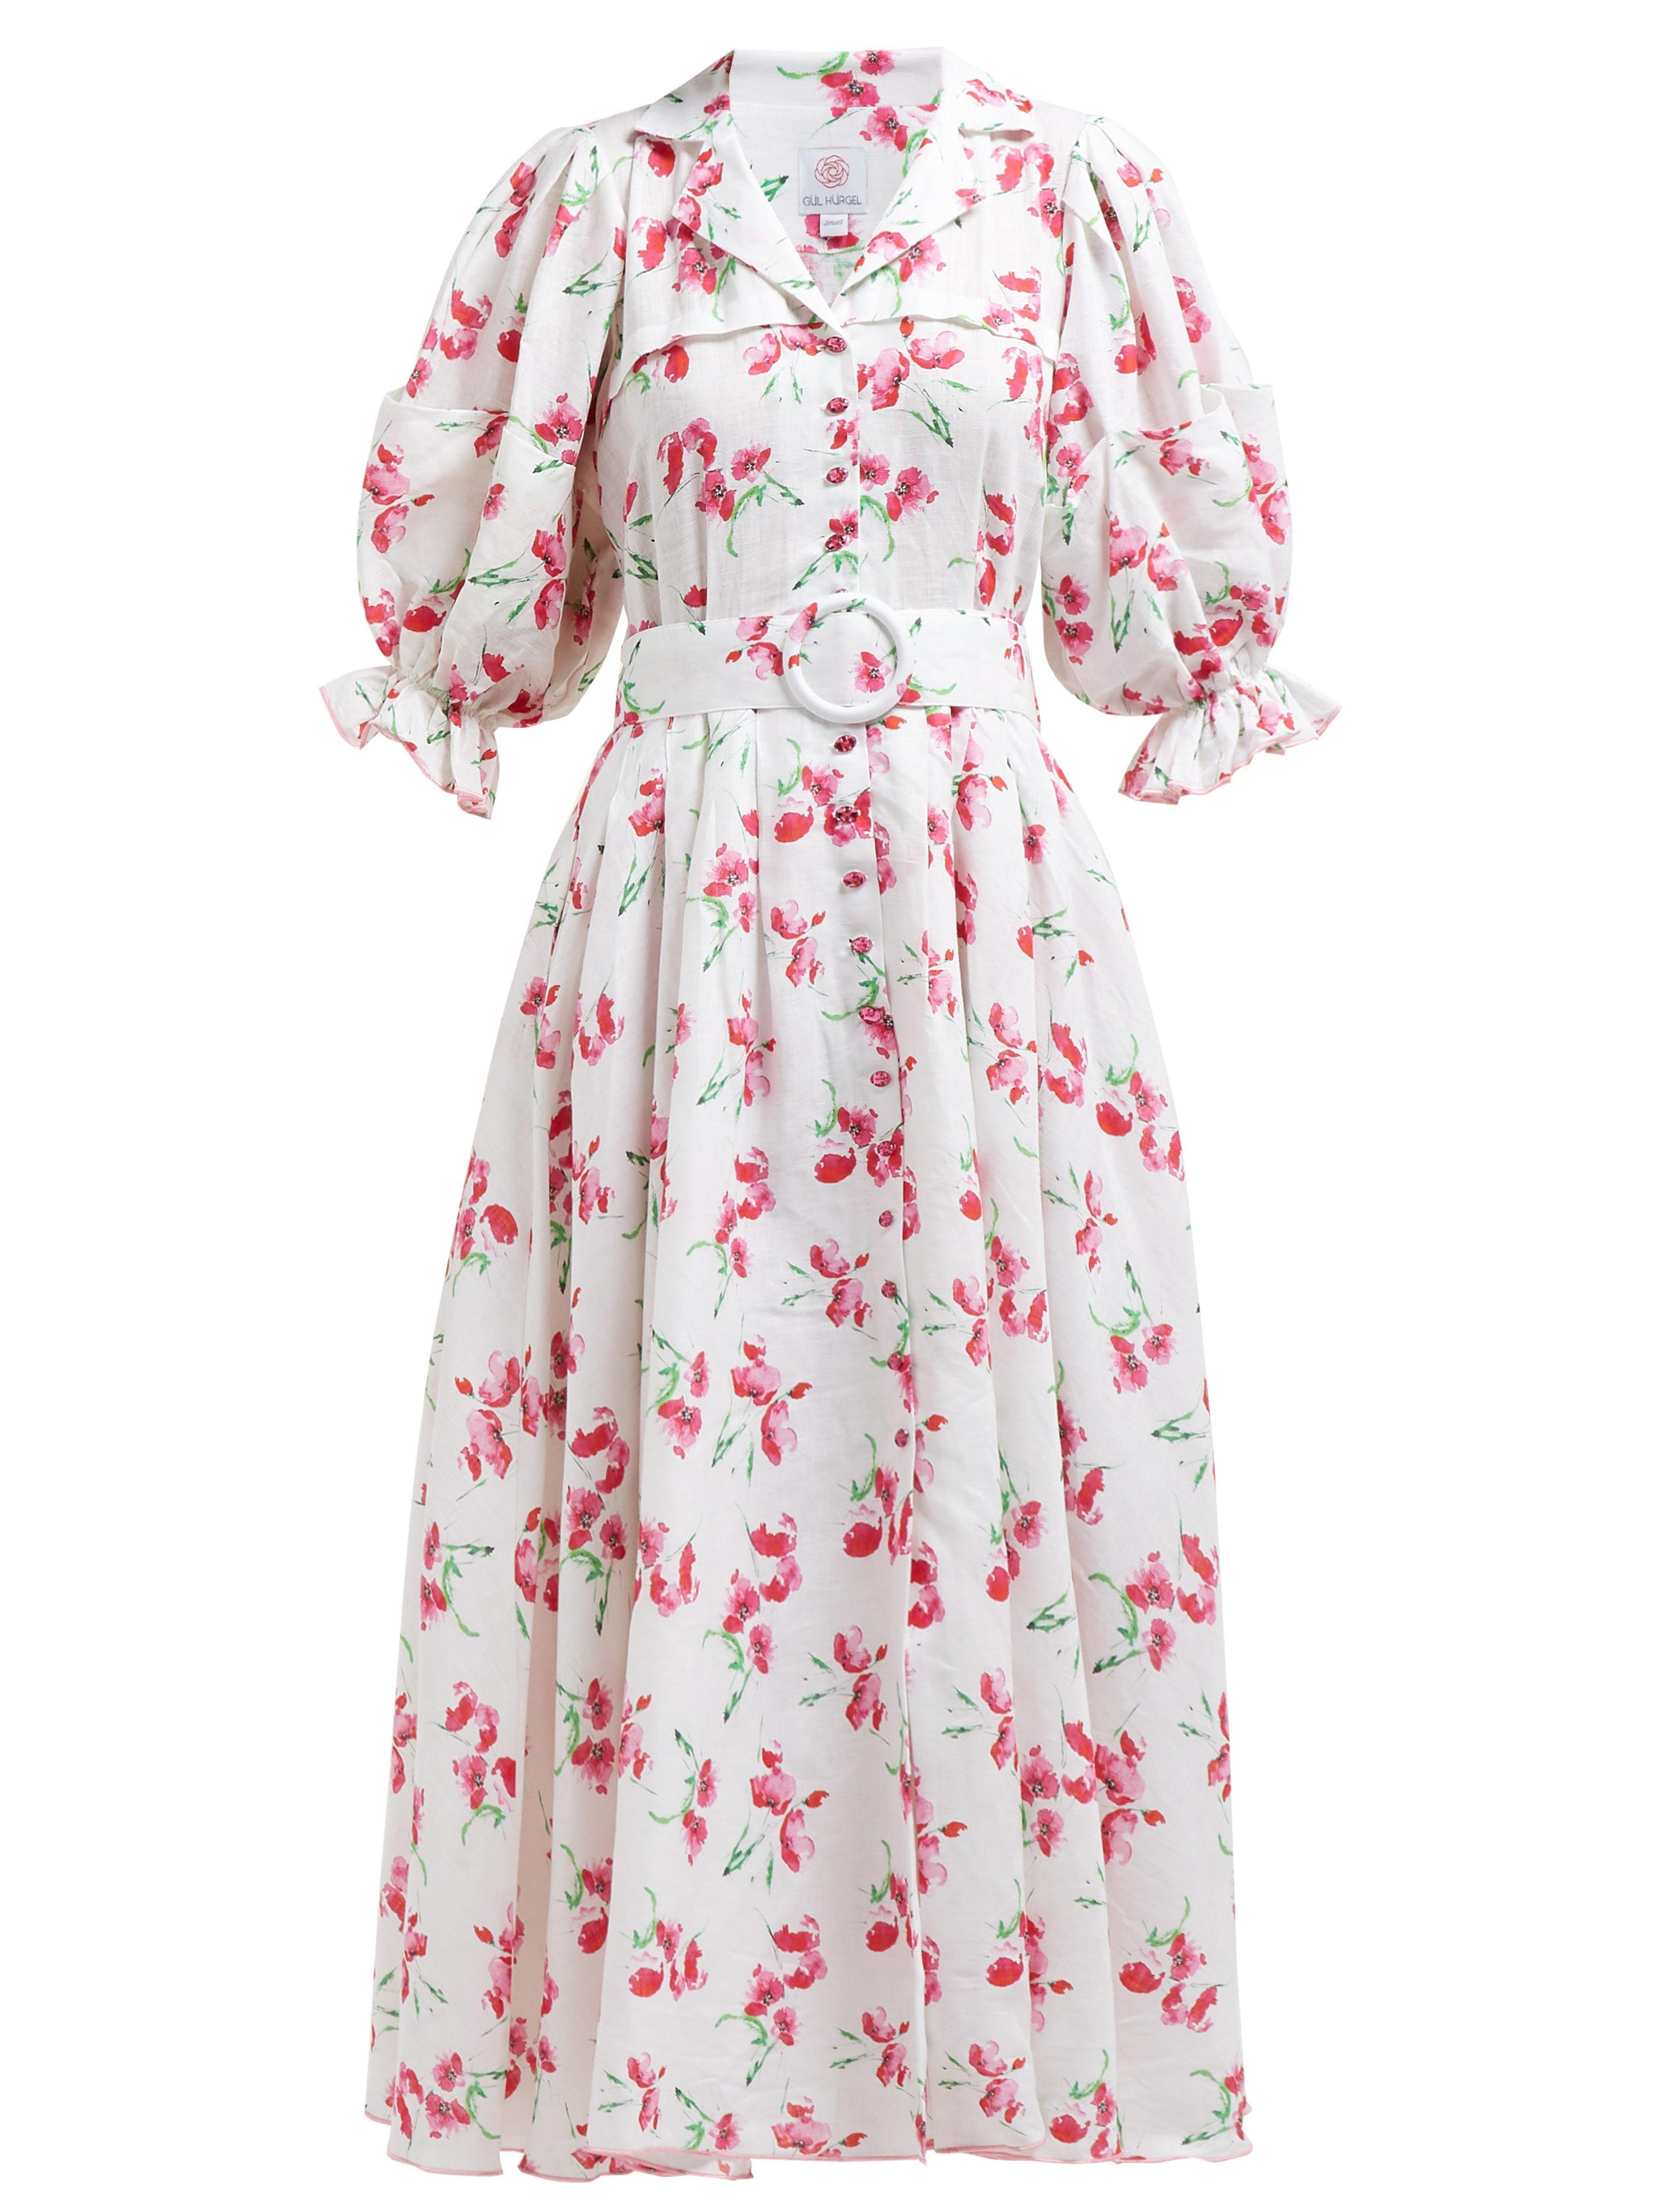 4d48d25468 Gül Hürgel - Pink Floral Print V Neck Linen Midi Dress - Lyst. View  fullscreen